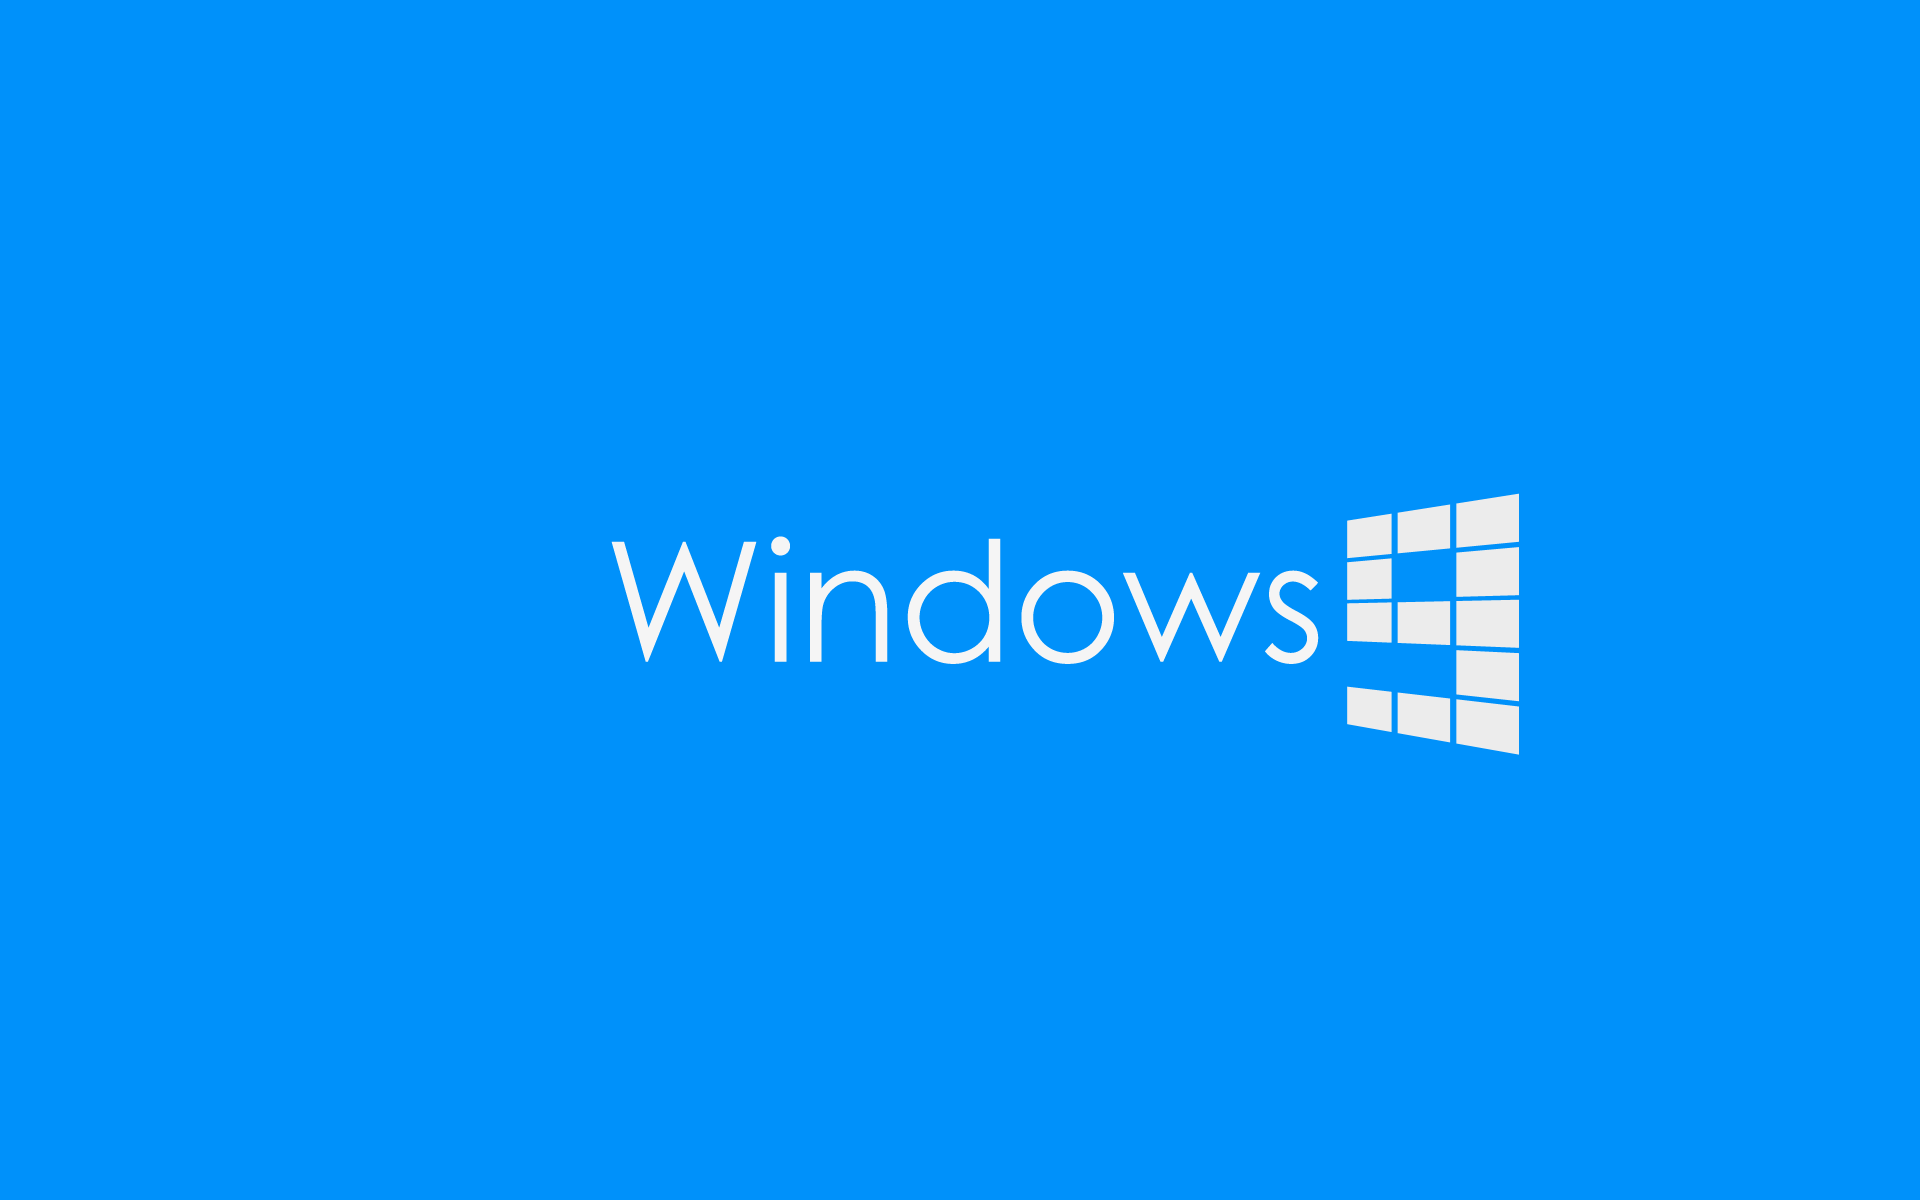 Wallpaper download microsoft - Microsoft Windows 9 Sky Blue Full Screen Desktop Background Wallpaper